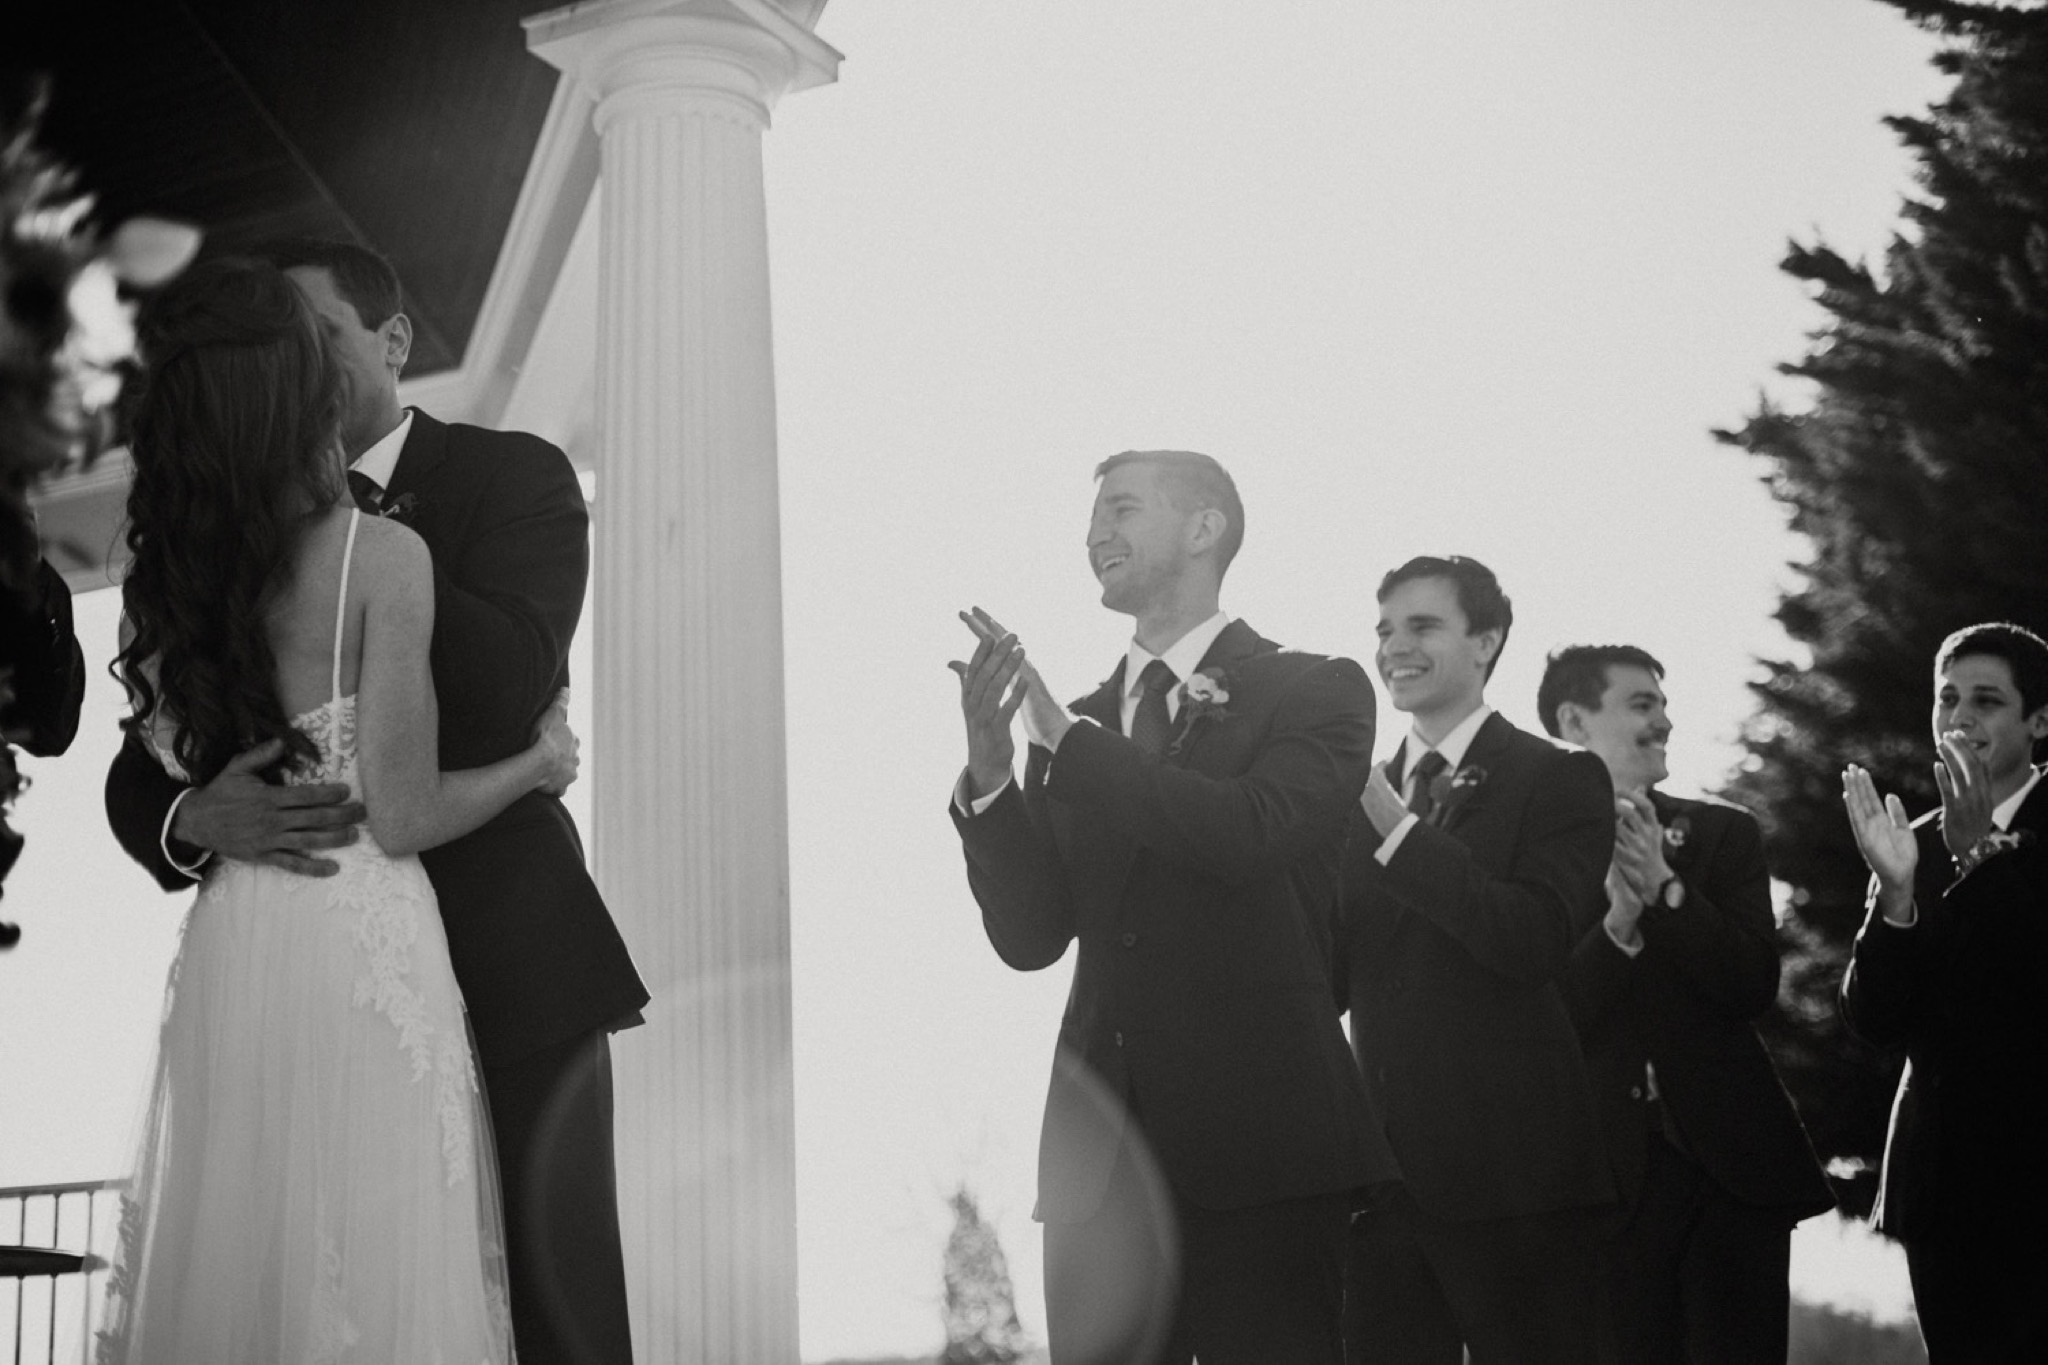 52_West Manor Estate Weddings - Pat Cori Photography-106_Ceremony_VirginiaWeddingPhotographer_PatCoriPhotography_WestManorEstate_Wedding.jpg